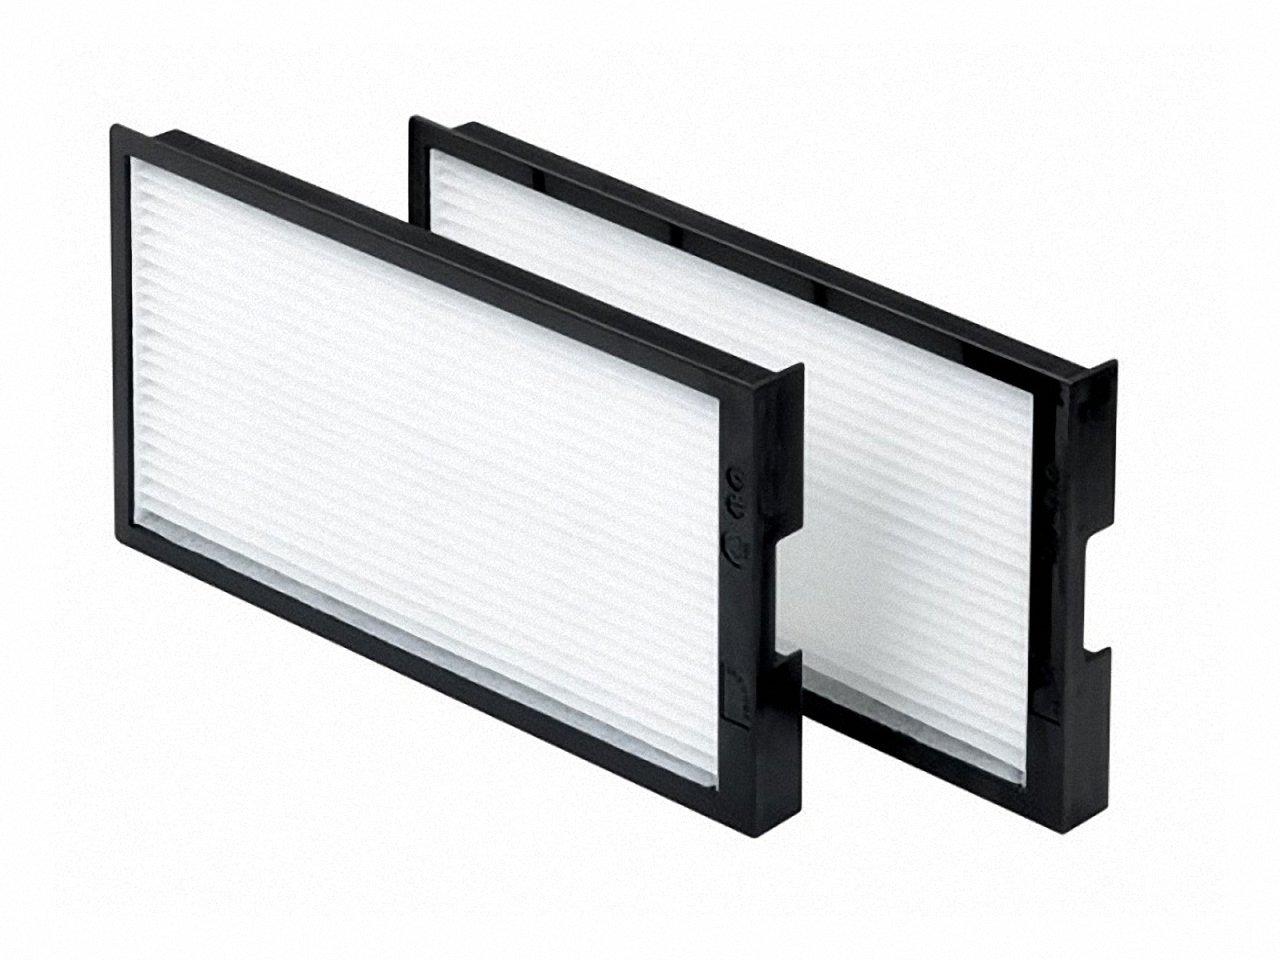 Zehnder Juego de filtros para comfoair 200, G4, 2 unidades 2unidades